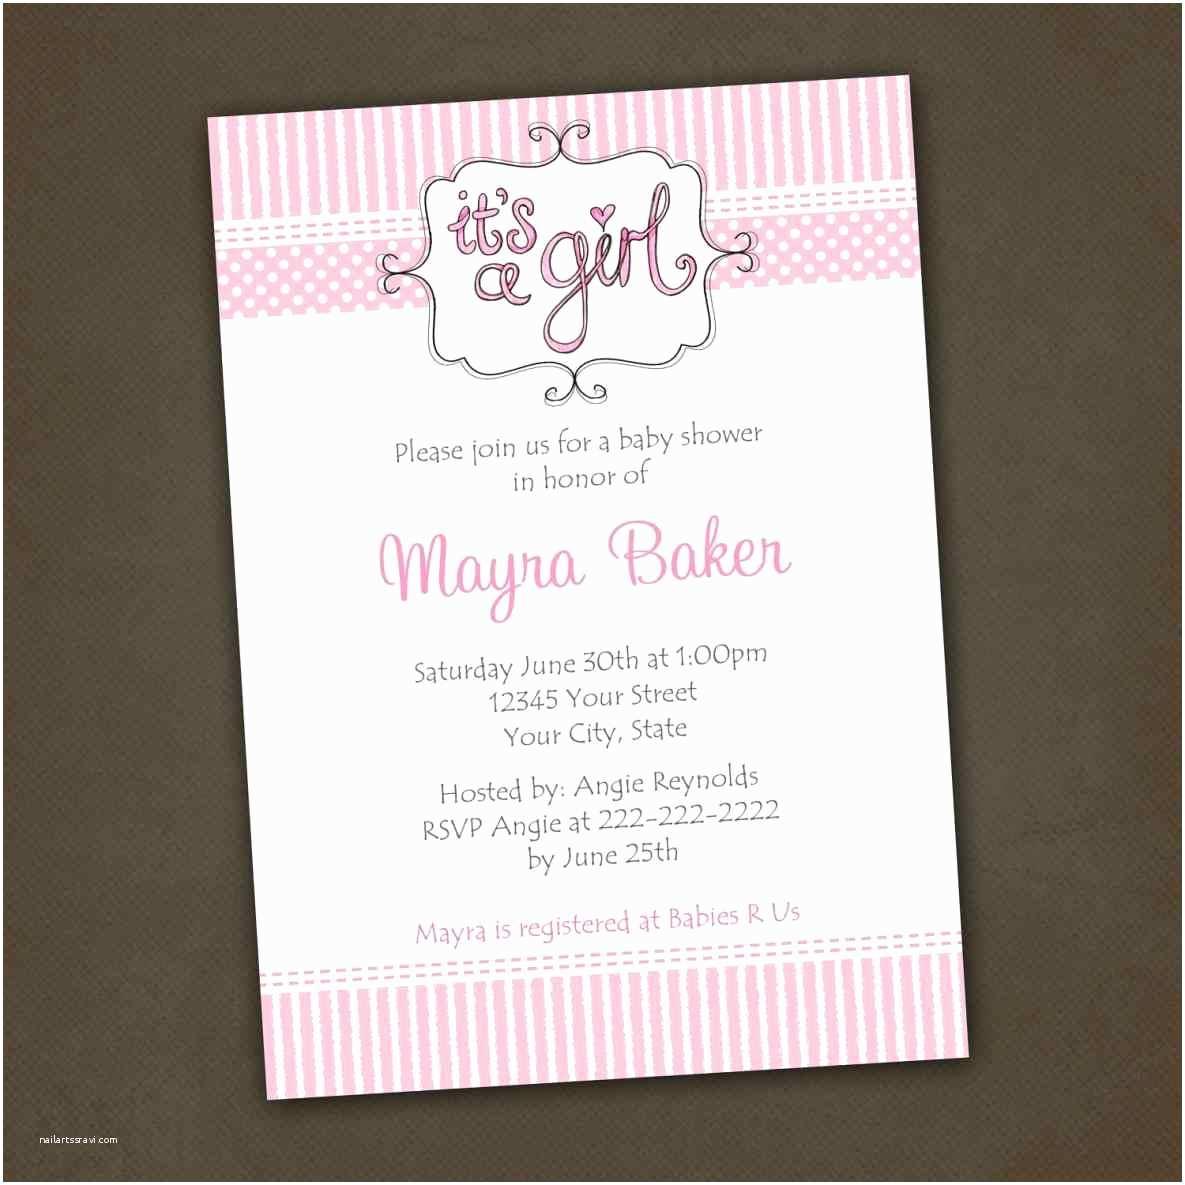 Girl Baby Shower Invitation Wording Baby Shower Invitations for Girls Wording Ebb Li with